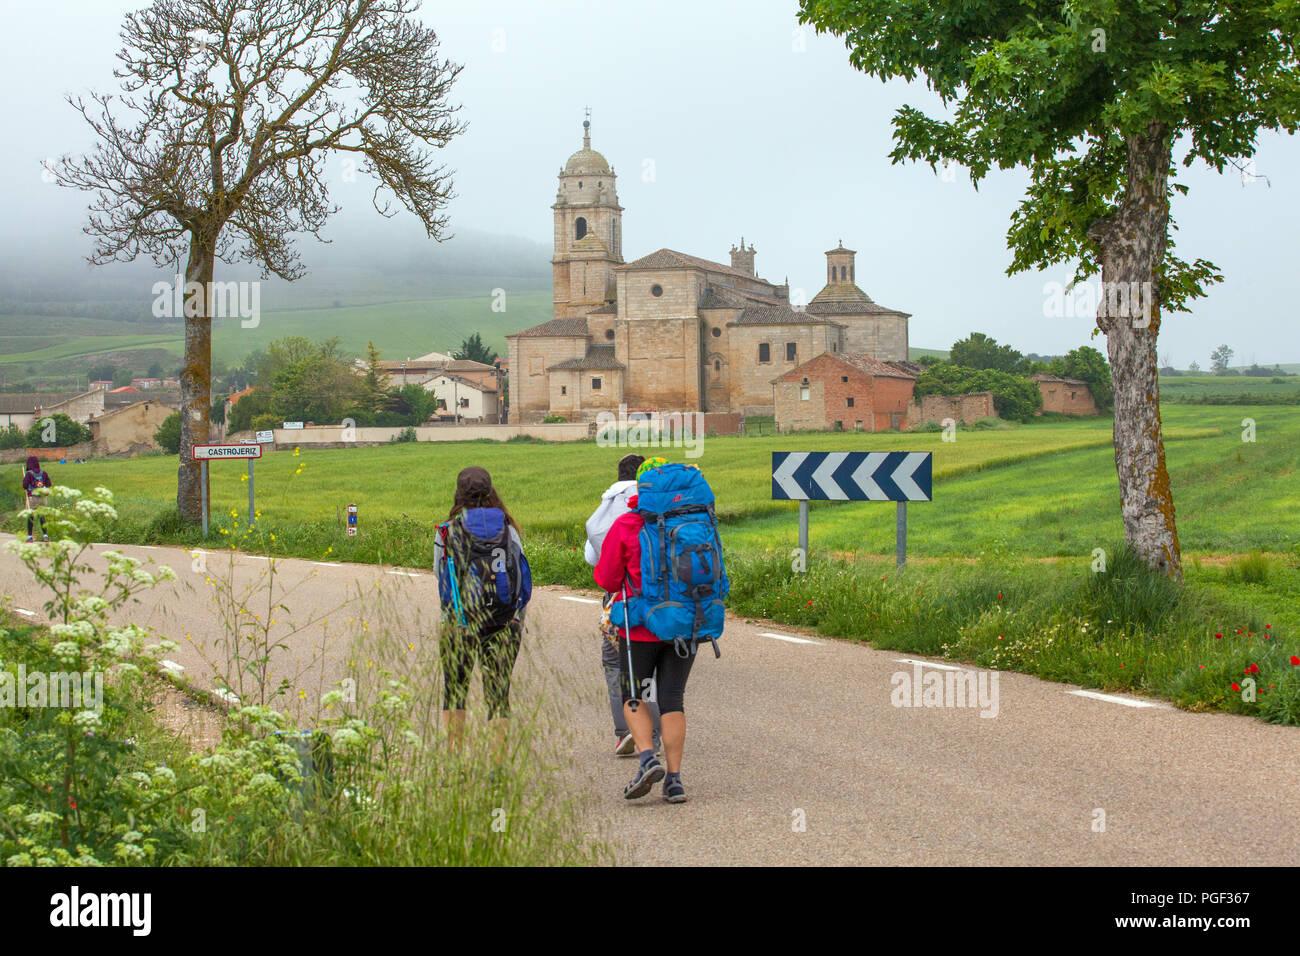 Pilgrims man and woman near the Colegiata de Santa Maria del Manzano while walking the Camino de Santiago the way of St James Castrojeriz Spain - Stock Image